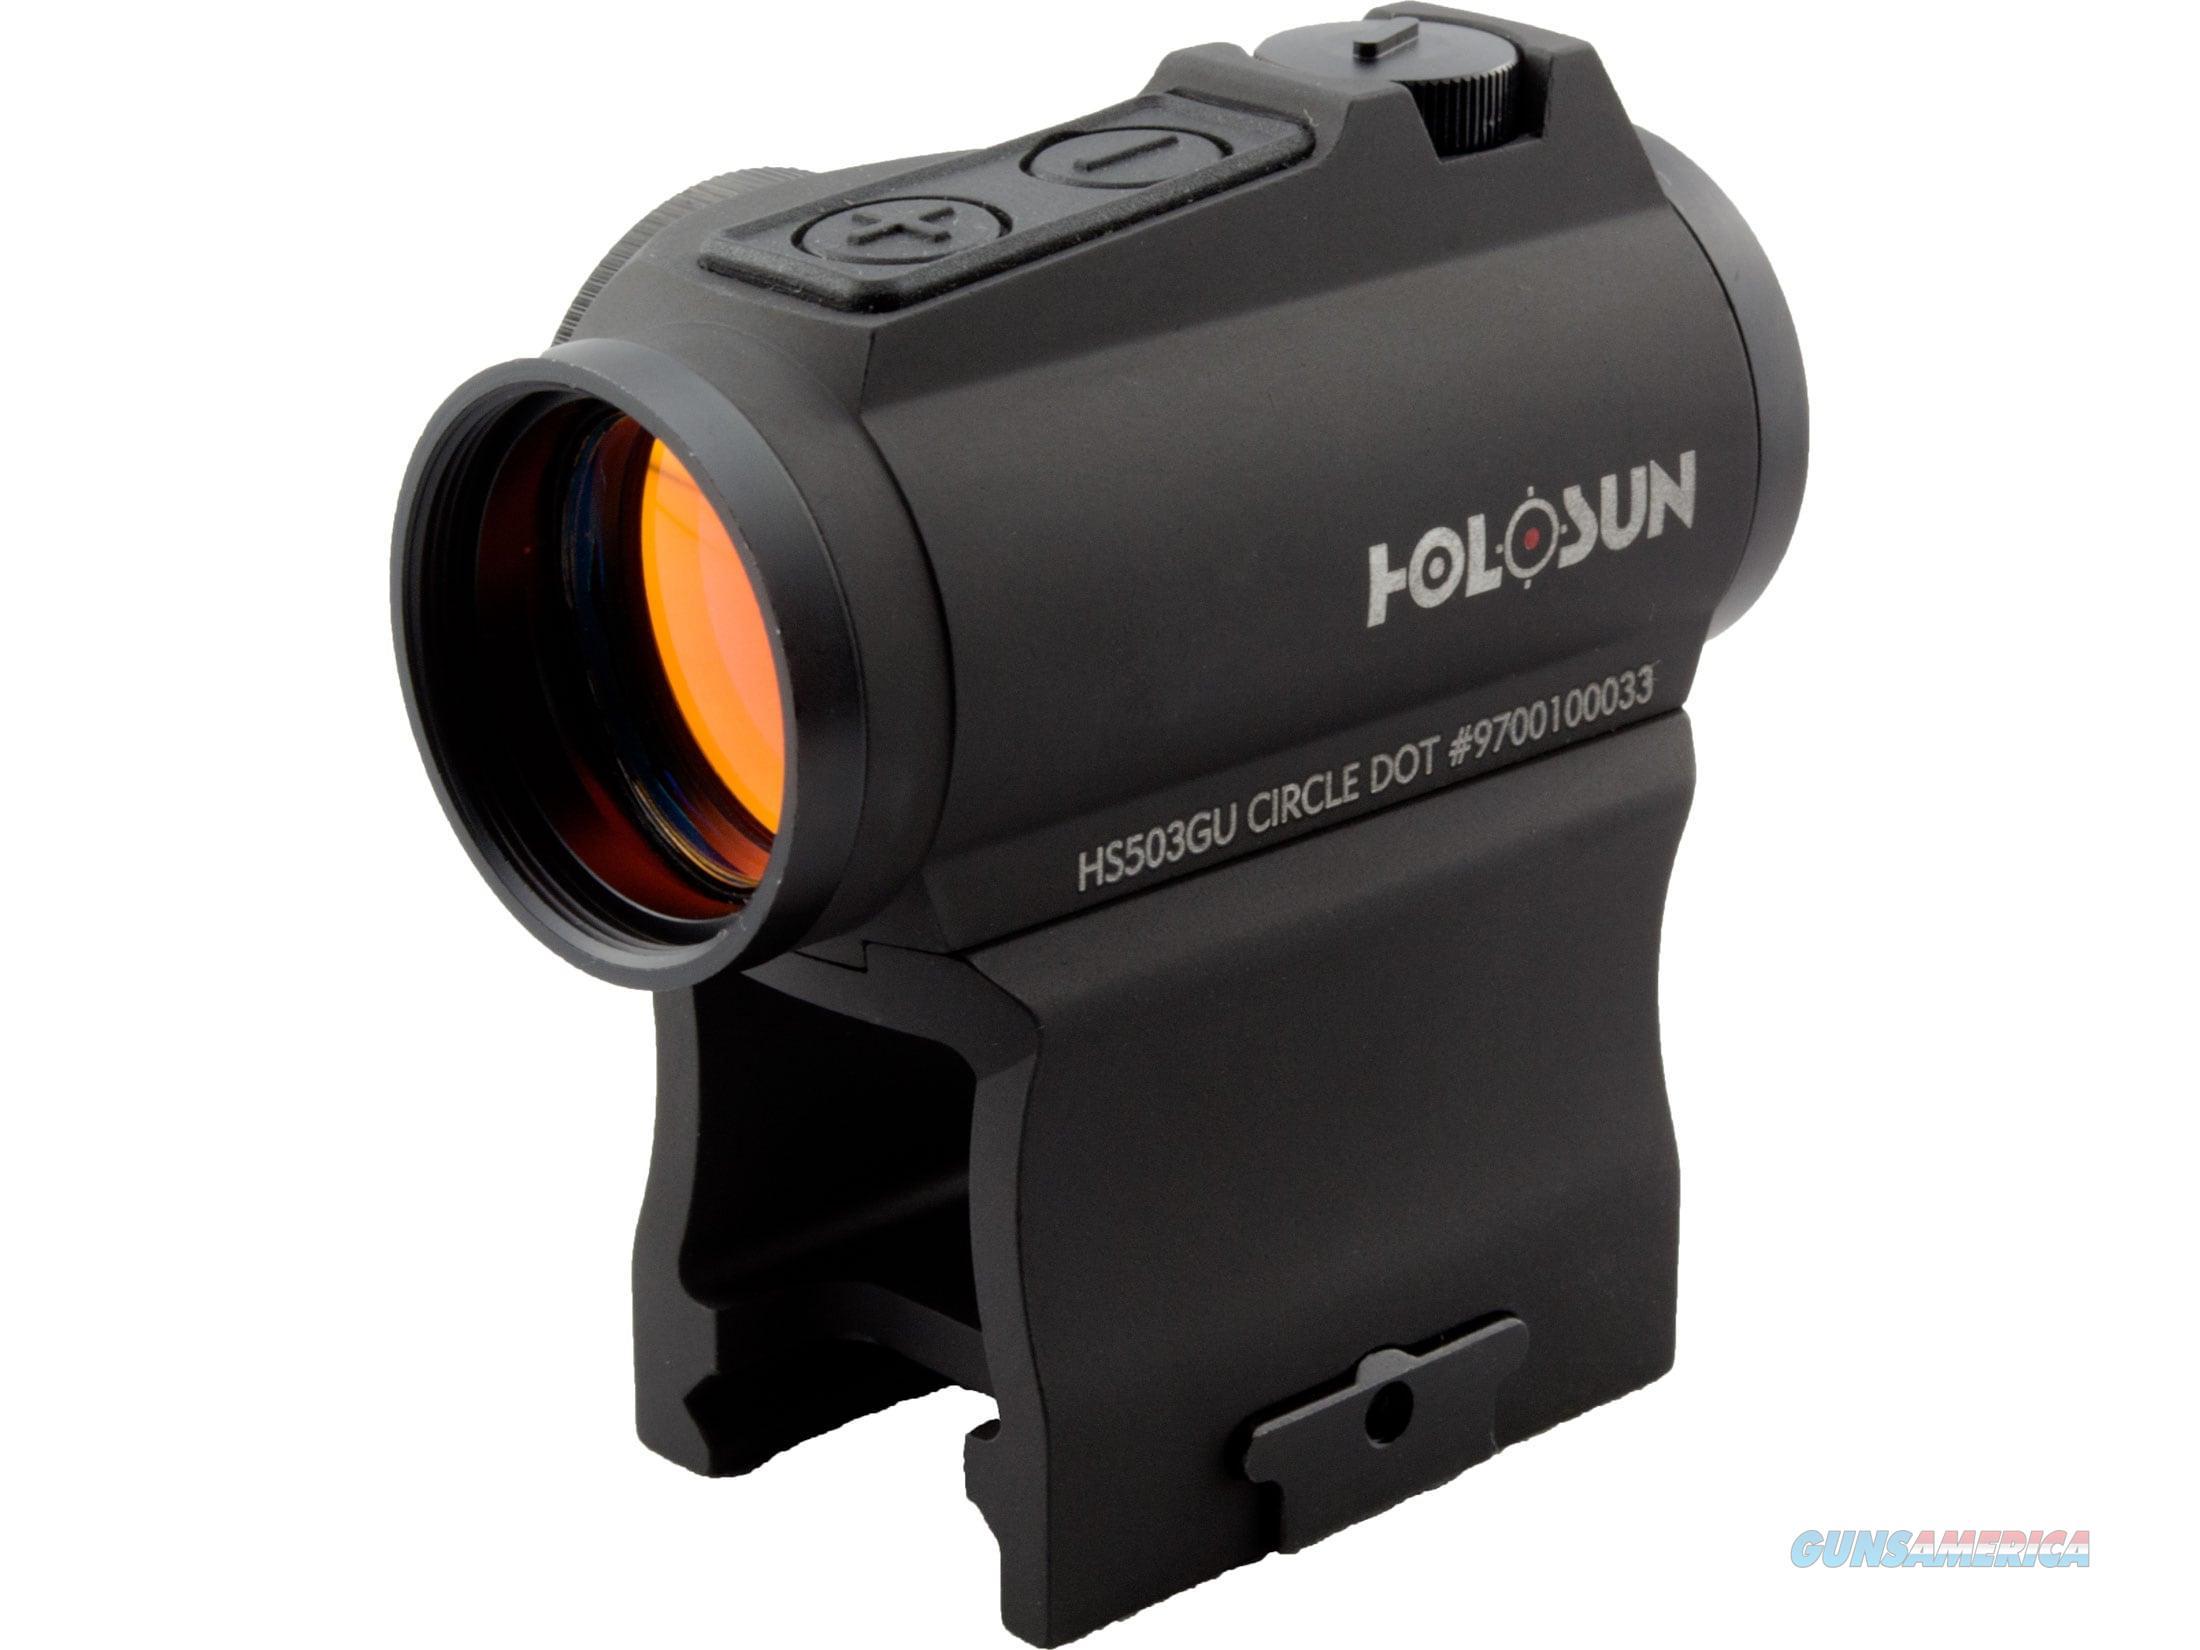 Holosun Red Dot Sight  Non-Guns > Scopes/Mounts/Rings & Optics > Non-Scope Optics > Other